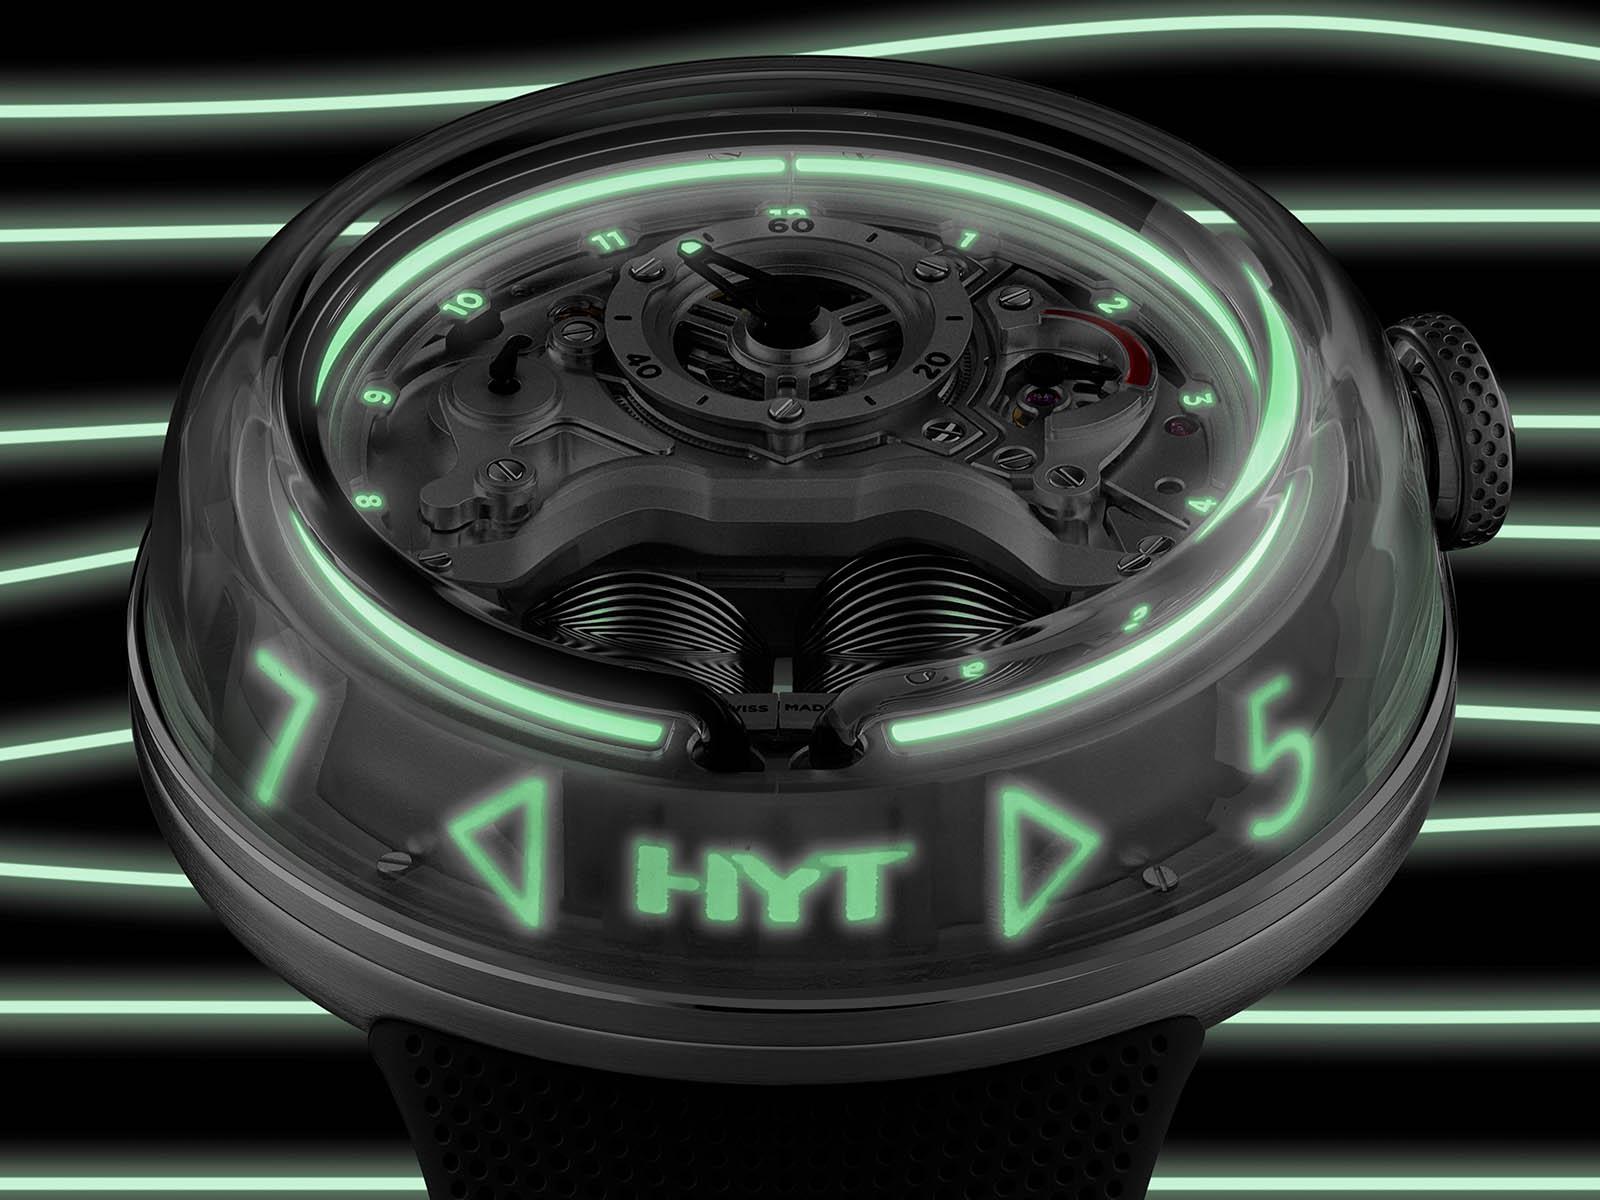 hyt-h5-1.jpg